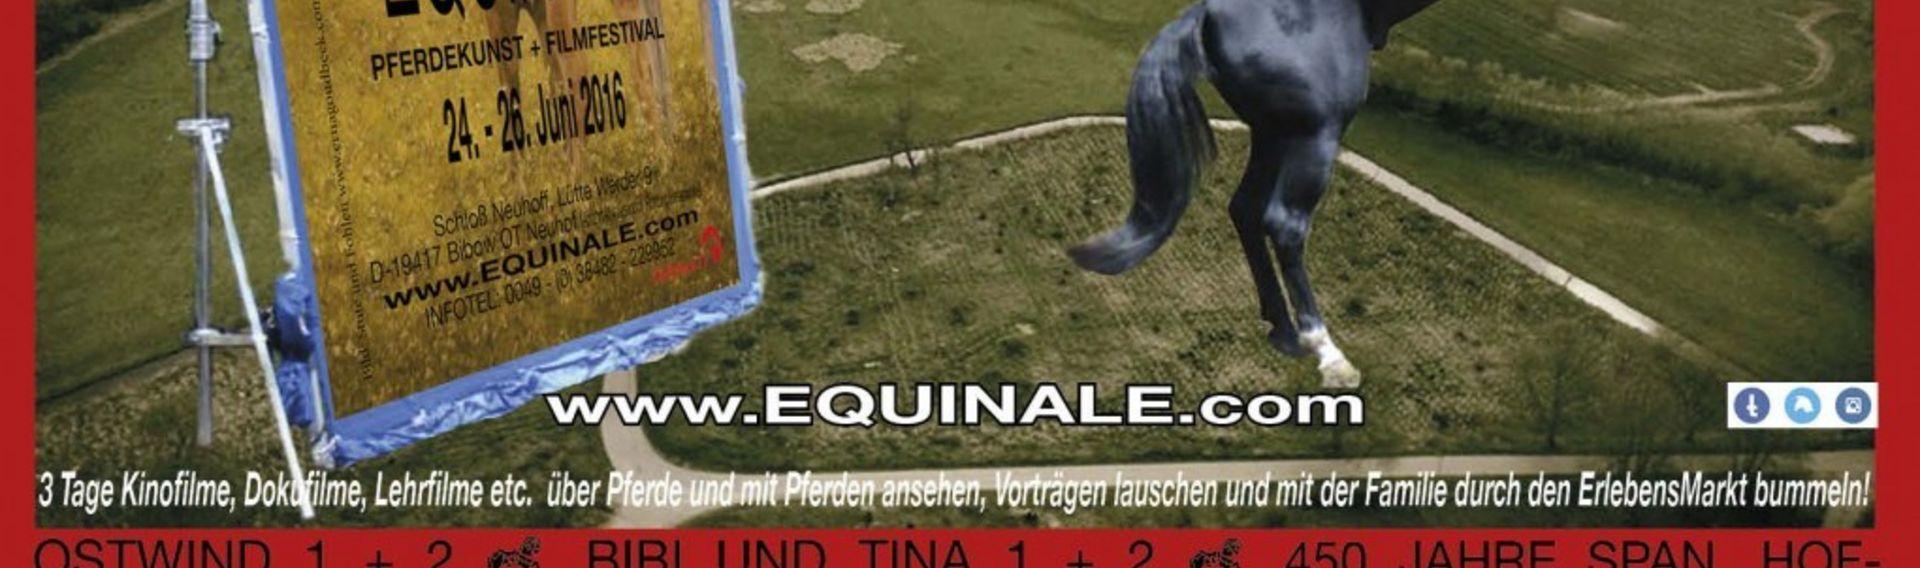 Equinale – Outdoor – PFERDE Filmfestival